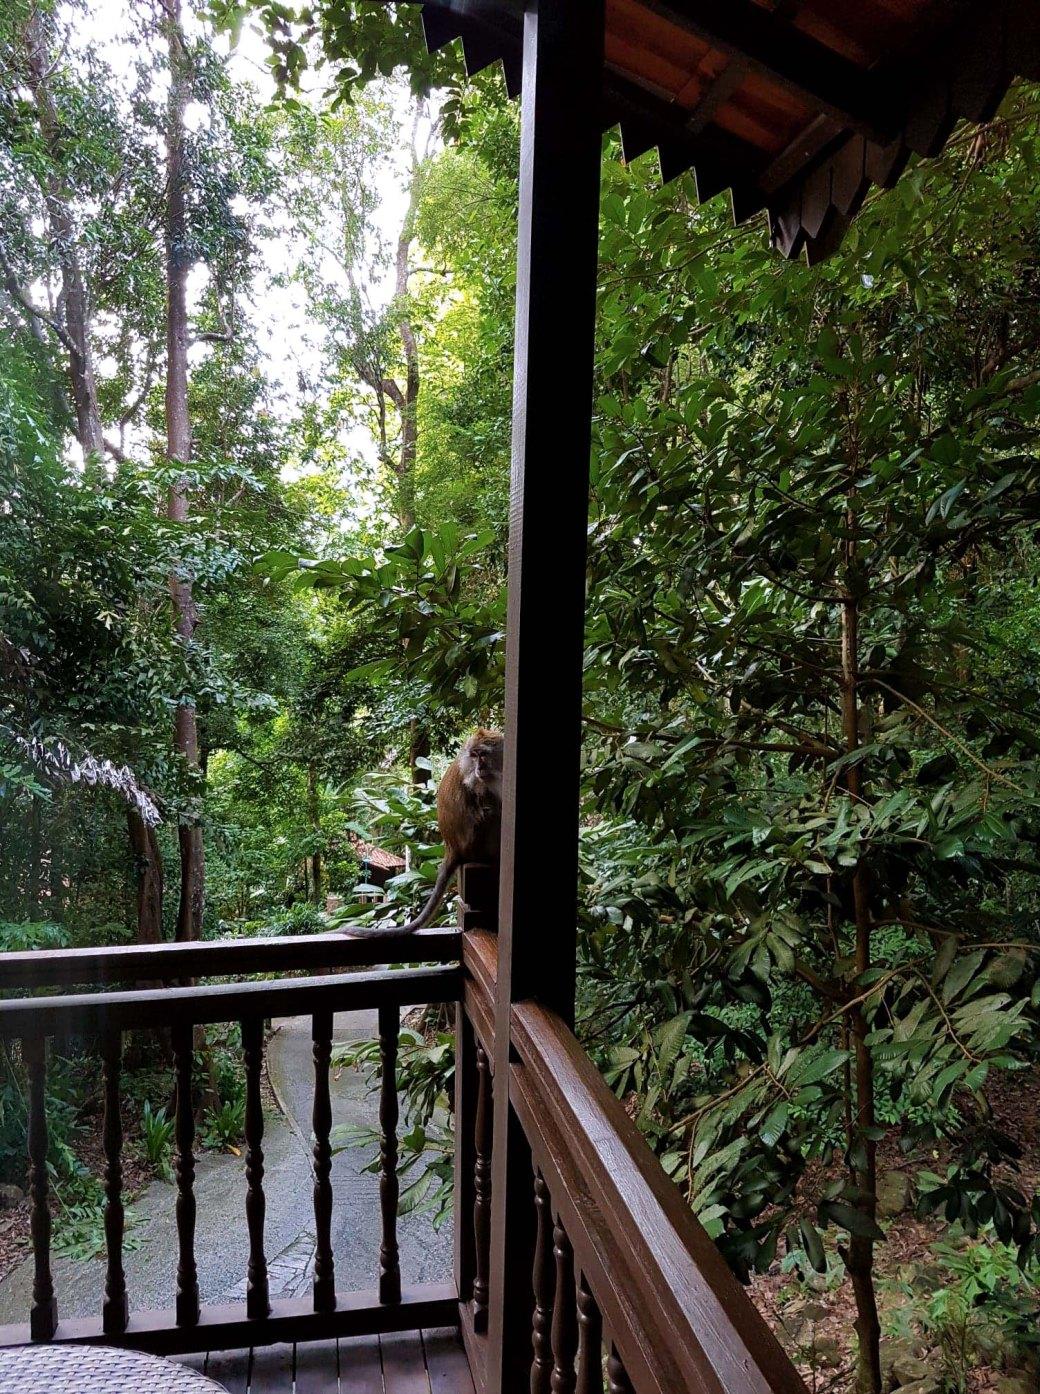 Monkeys on the balcony, Langkawi, Malaysia